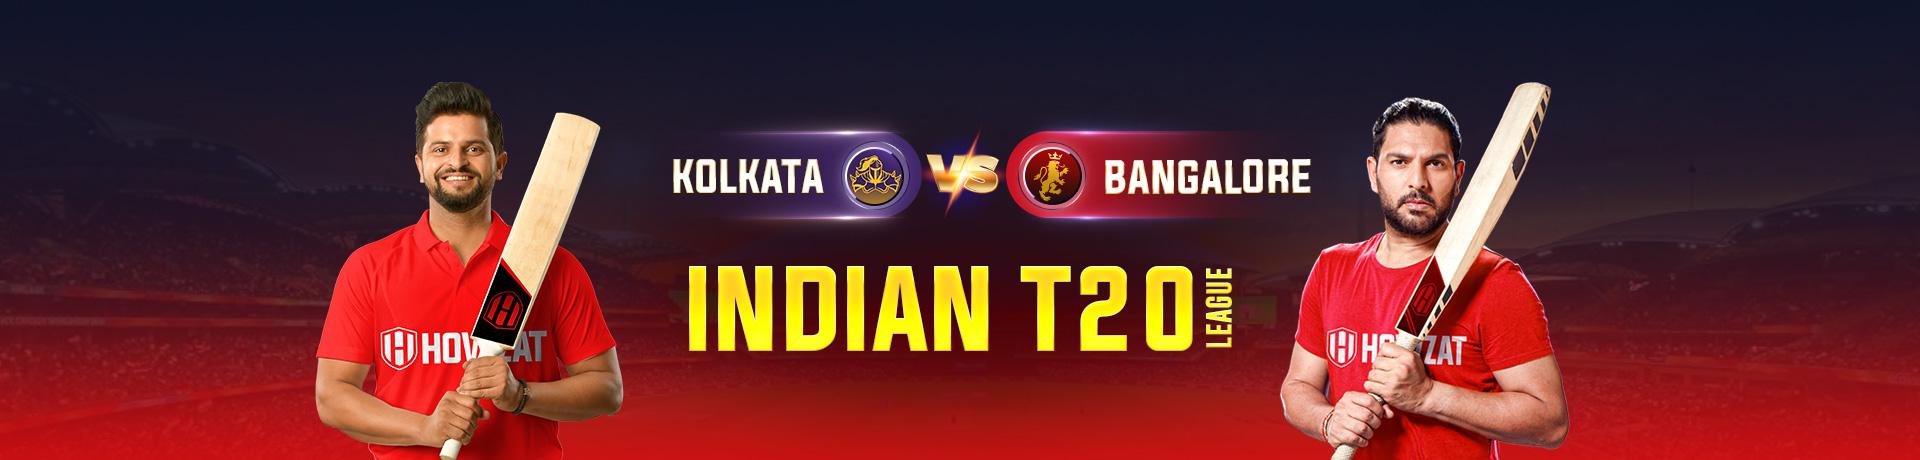 Kolkata vs Bangalore Indian T20 League